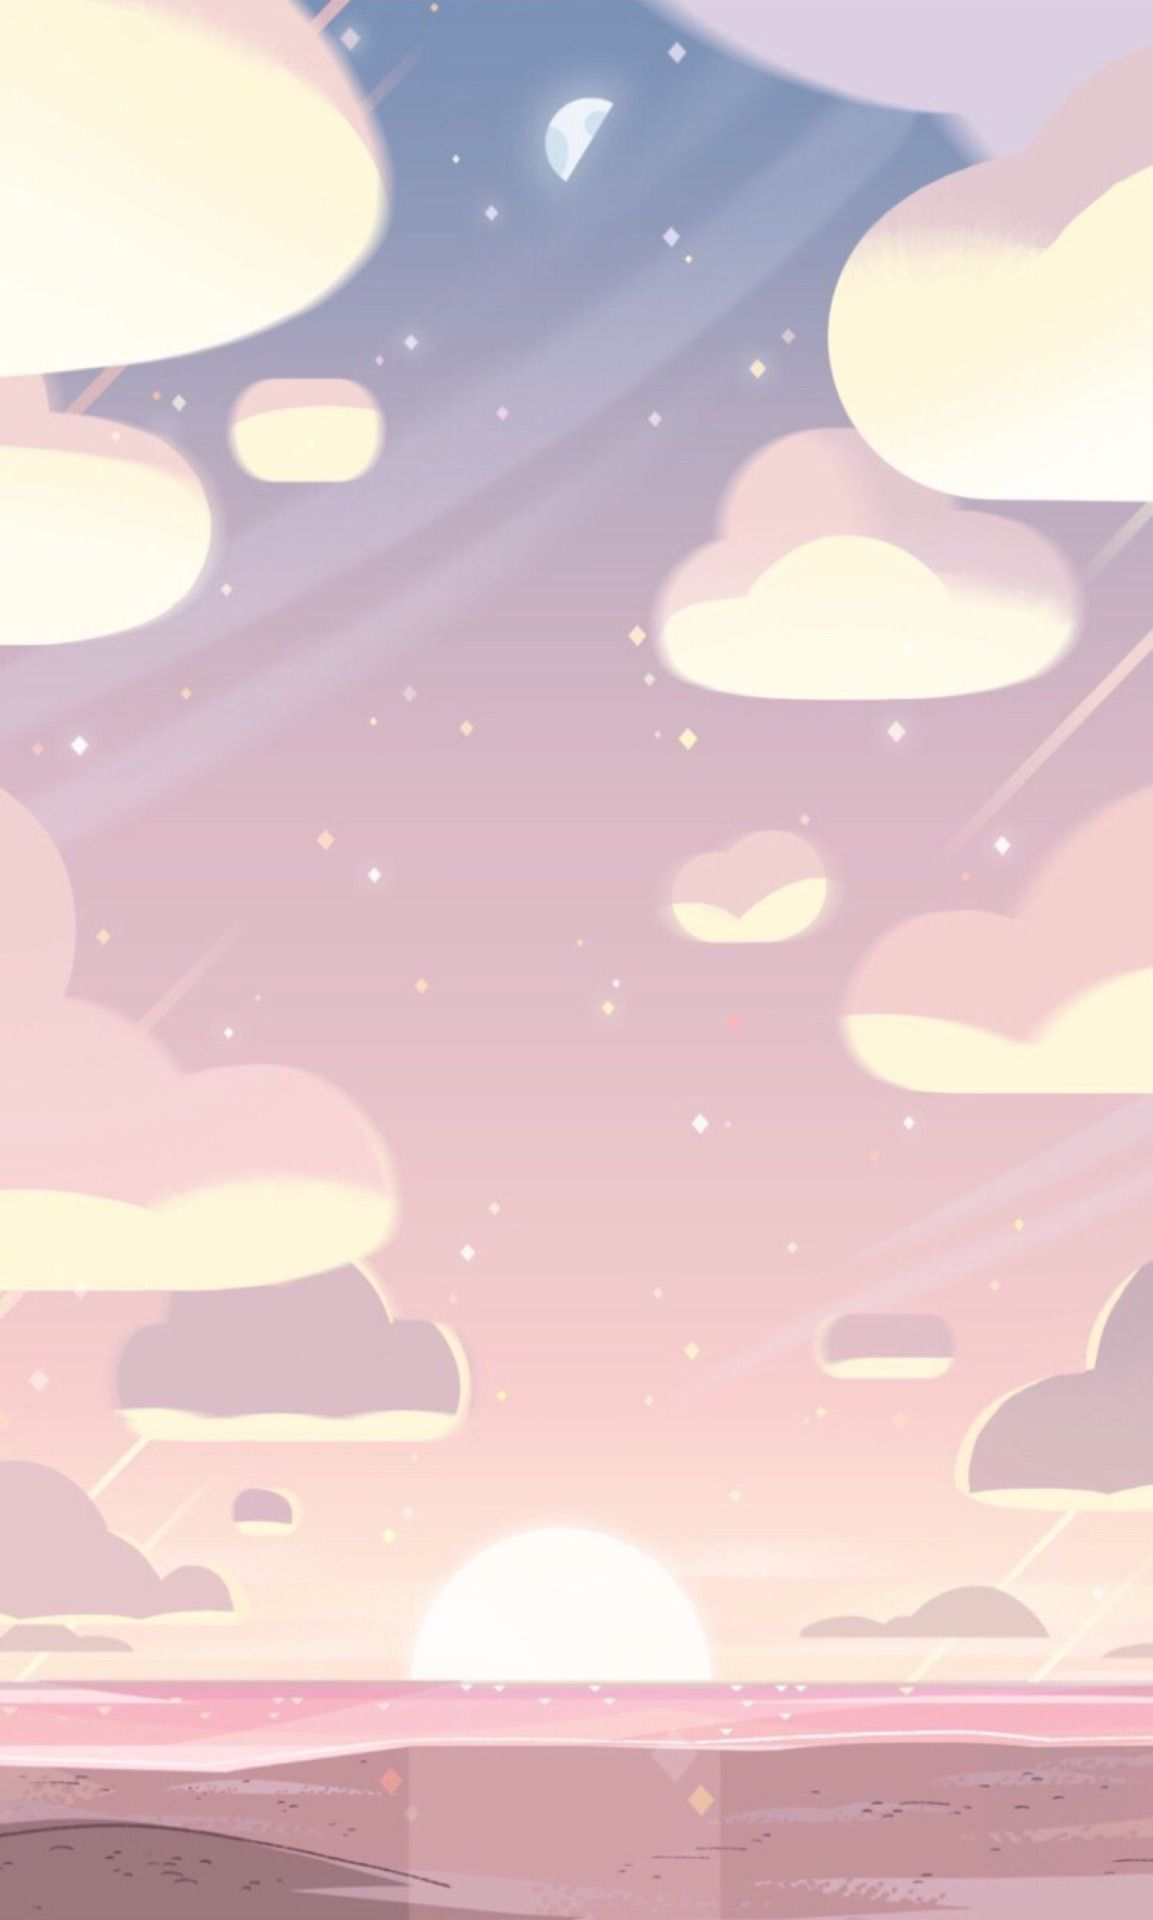 Unduh 82 Background Tumblr Disney Gratis Terbaru